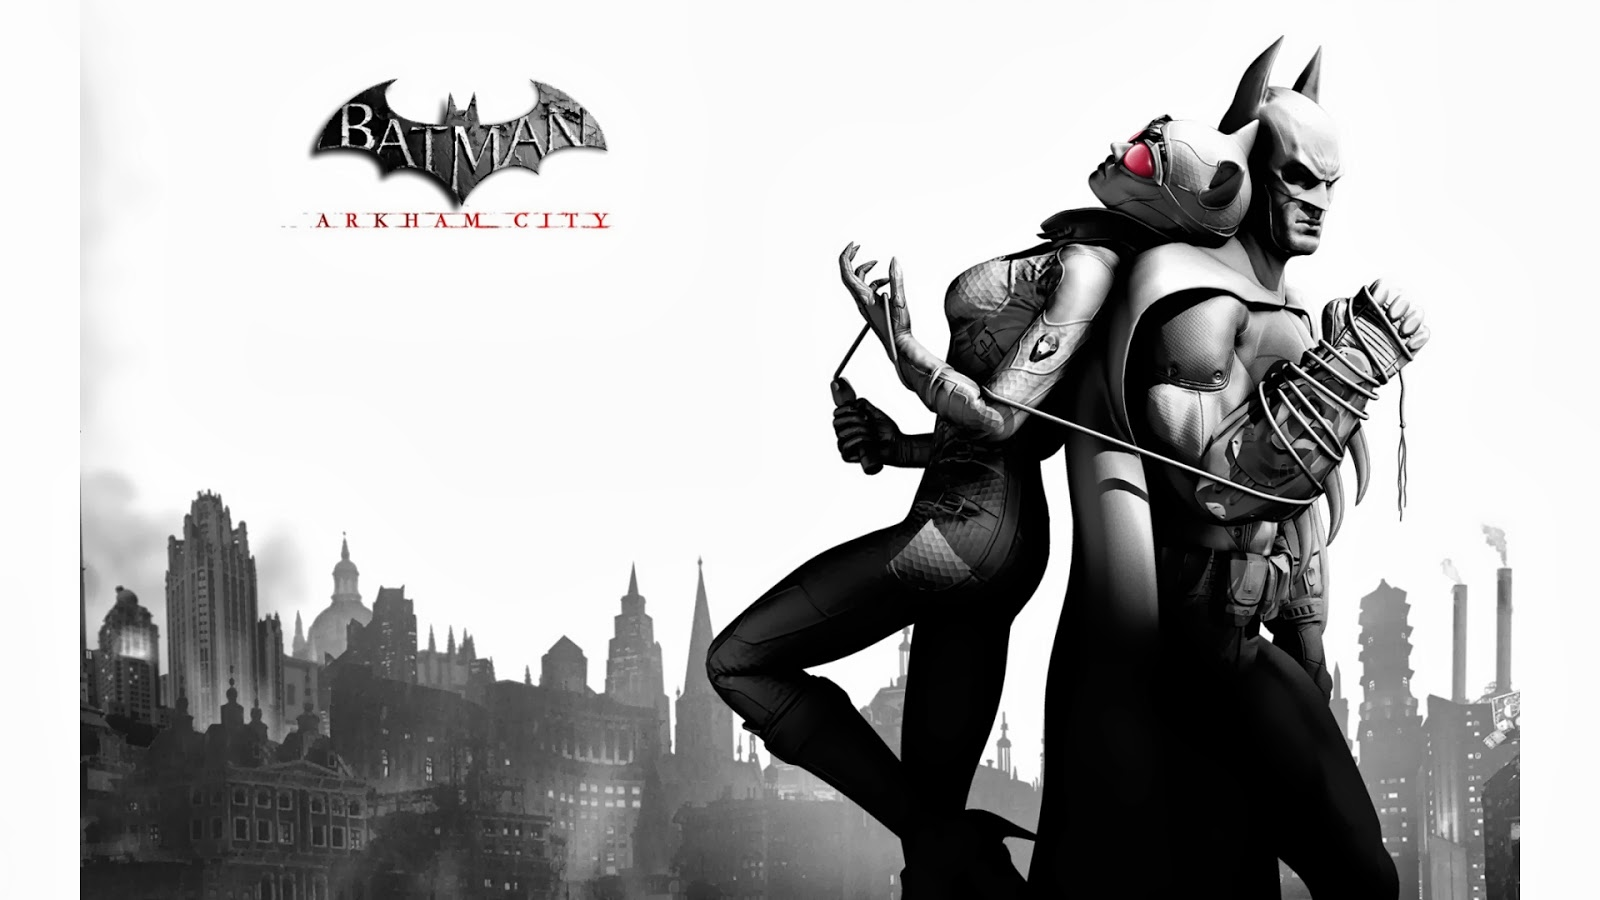 Fondo de pantalla Juegos batman arkham city | Fondo Pantalla Online